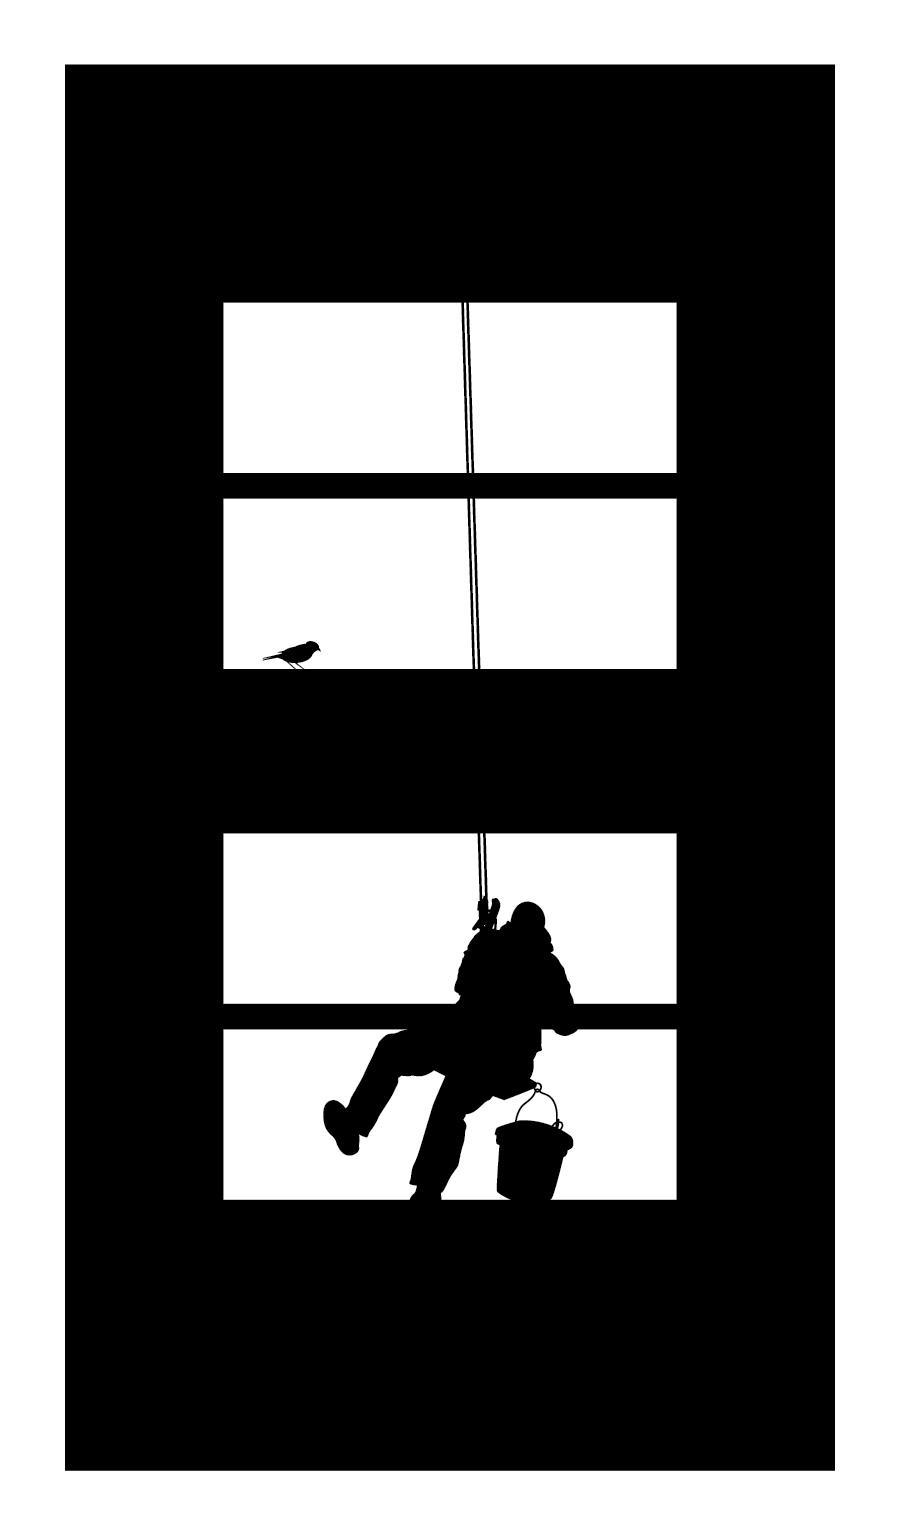 Fig. 10 - Window washer